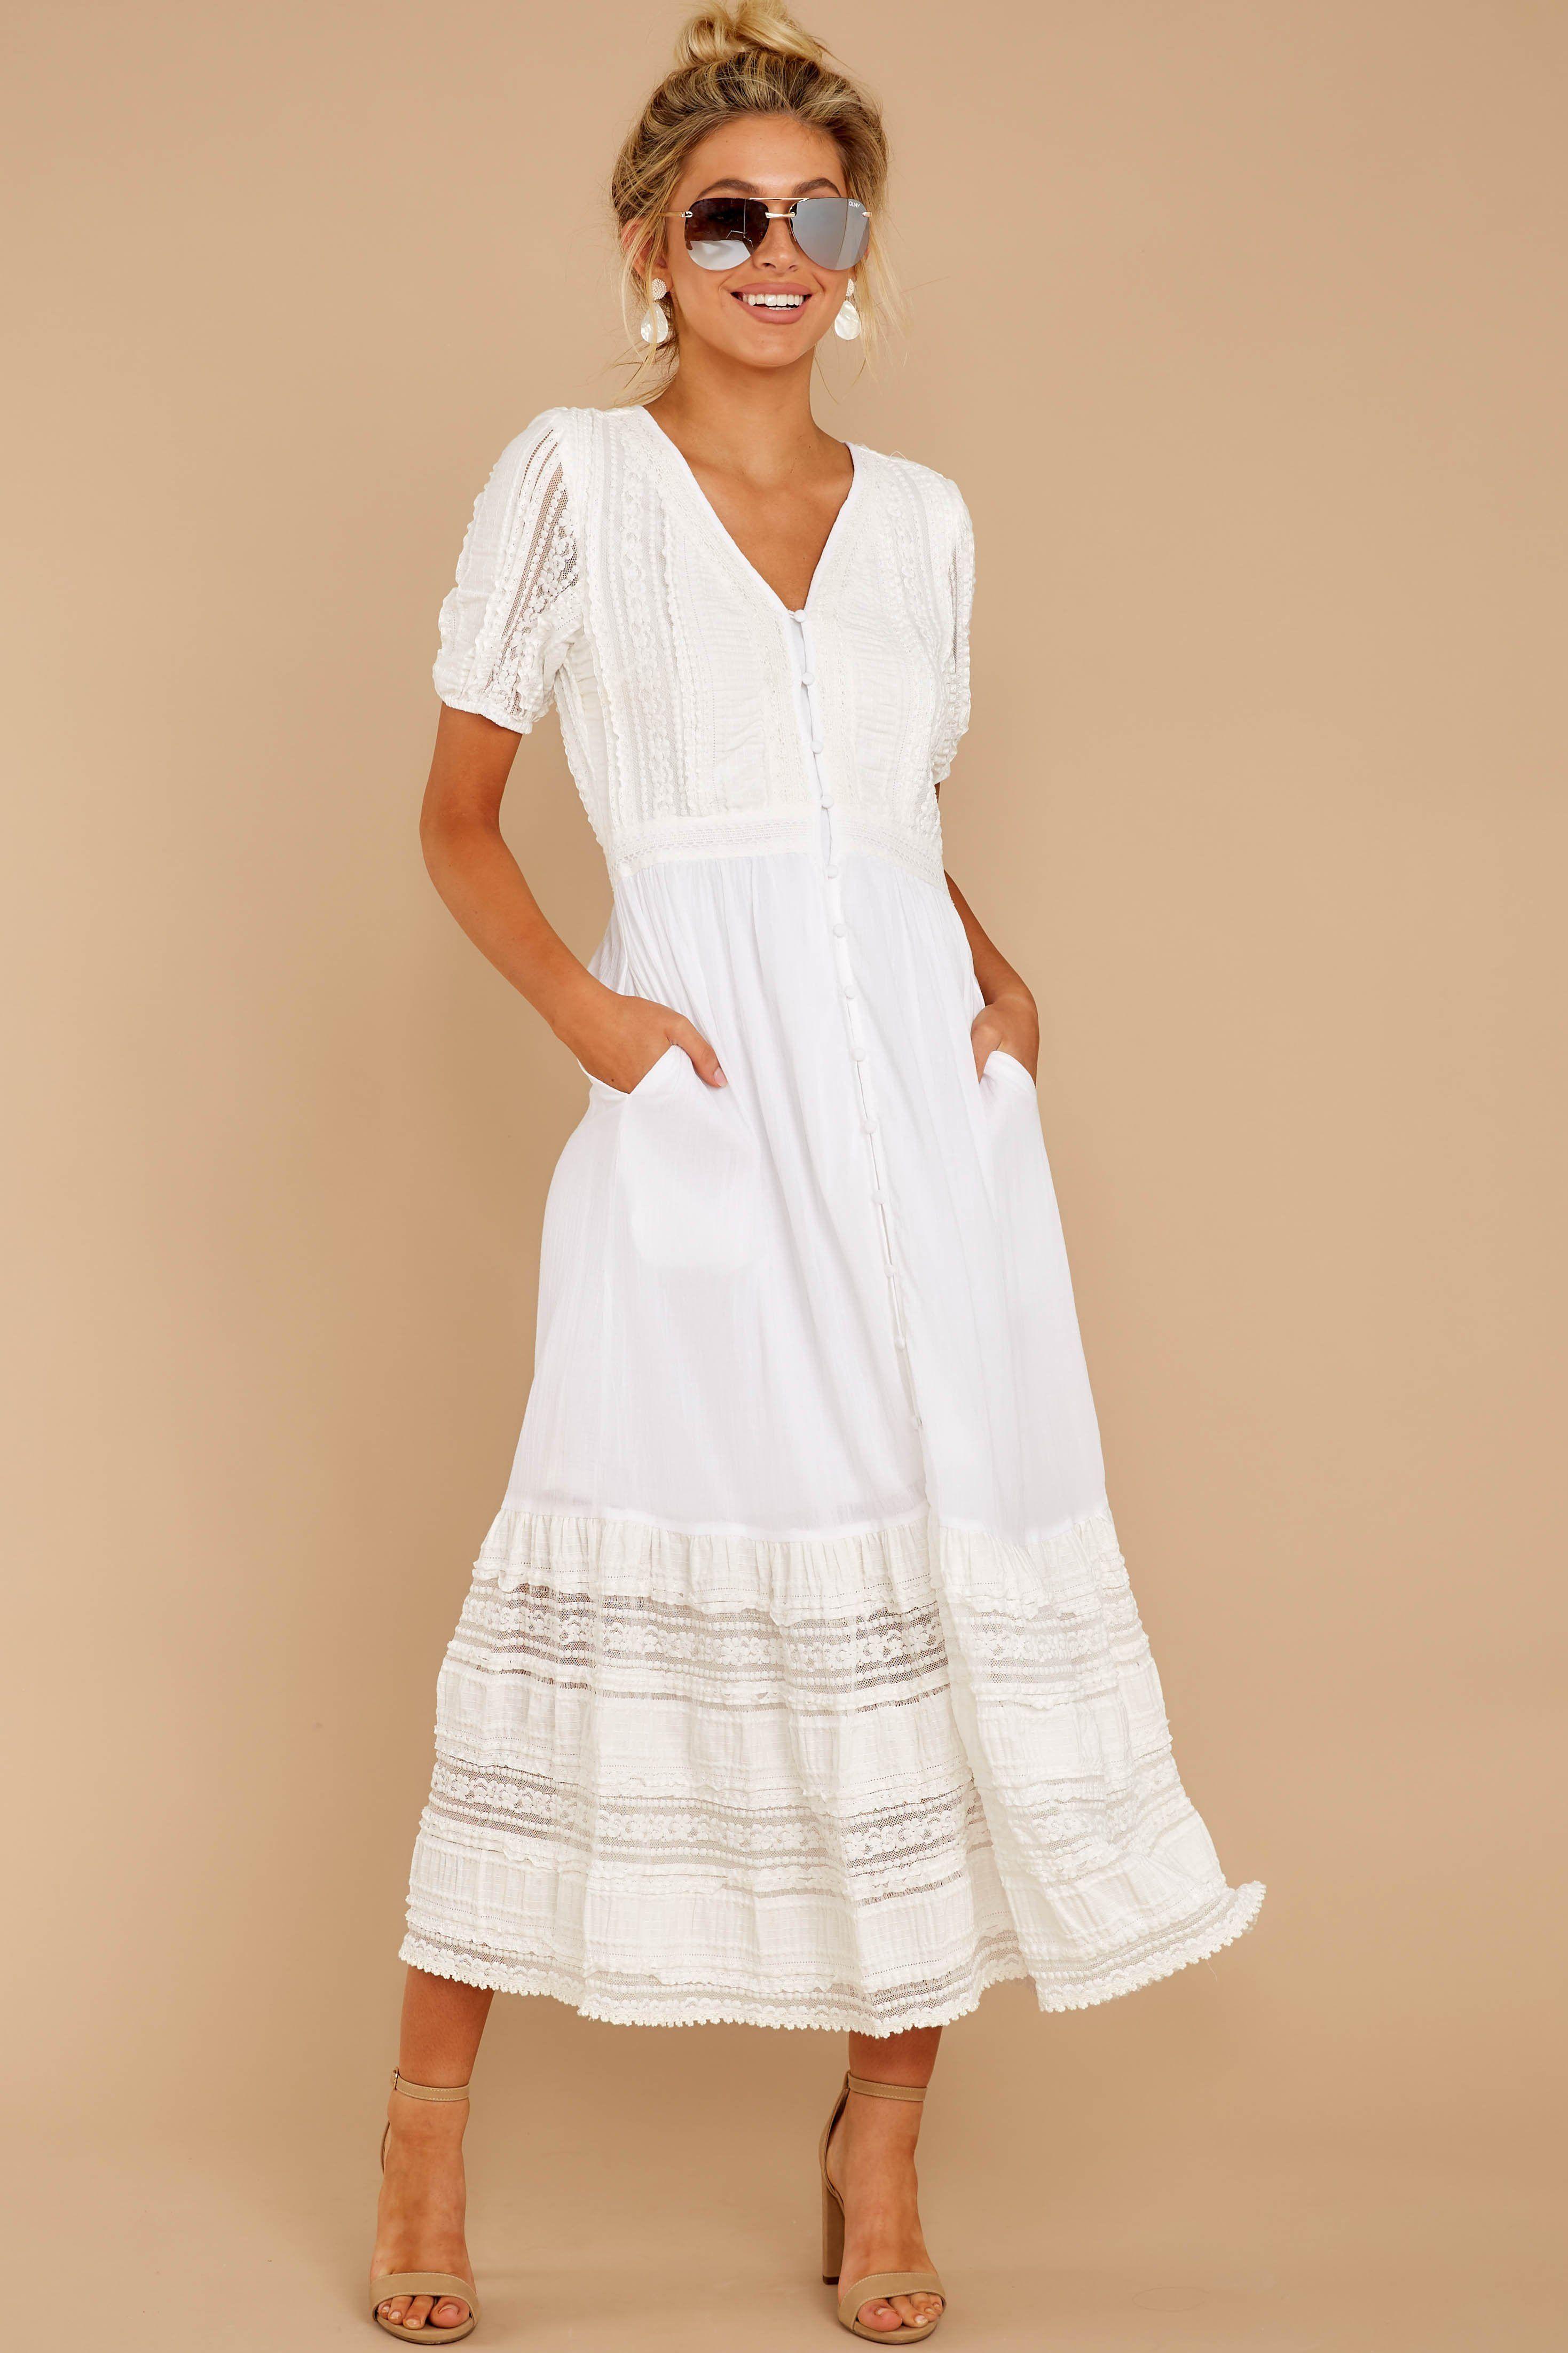 Pin By Ensa Louw On Fashion White Boho Dress Casual White Dress White Maxi Dresses [ 4406 x 2937 Pixel ]